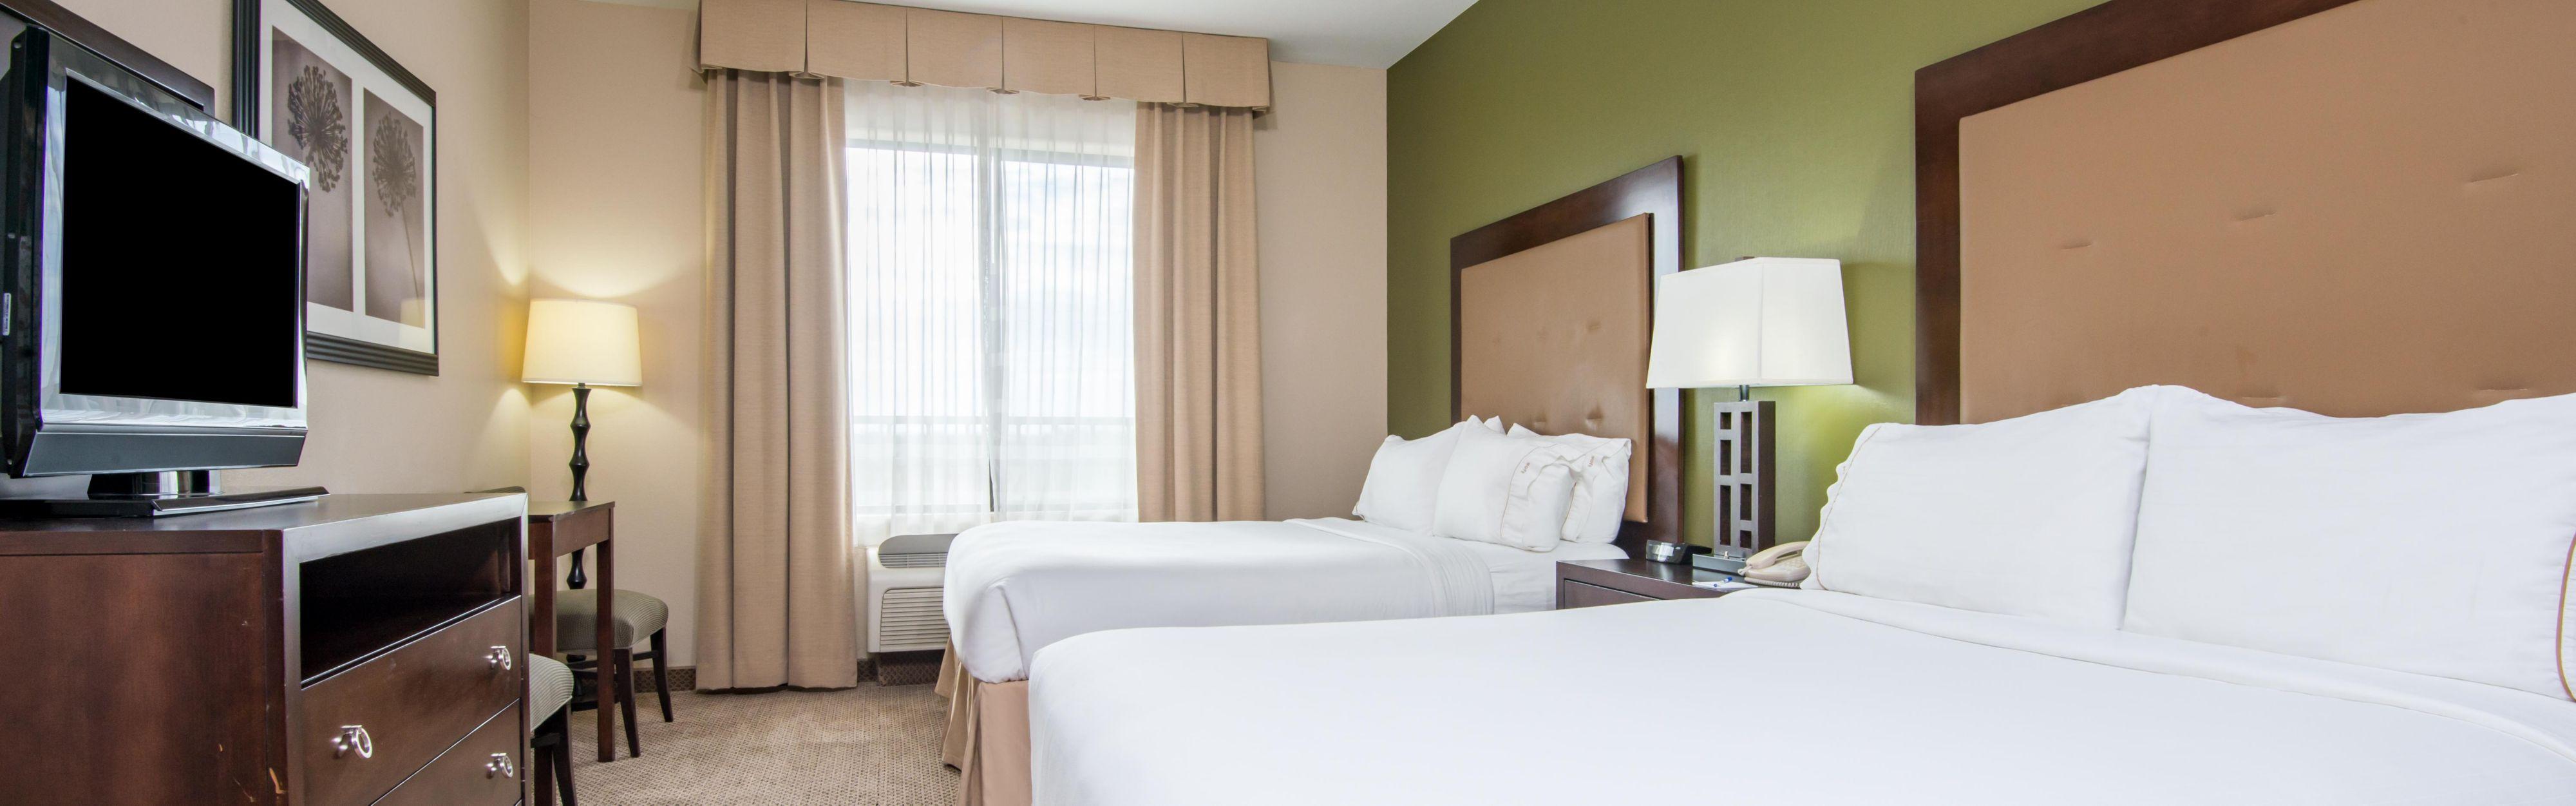 Holiday Inn Express & Suites Phoenix - Glendale Sports Dist image 1